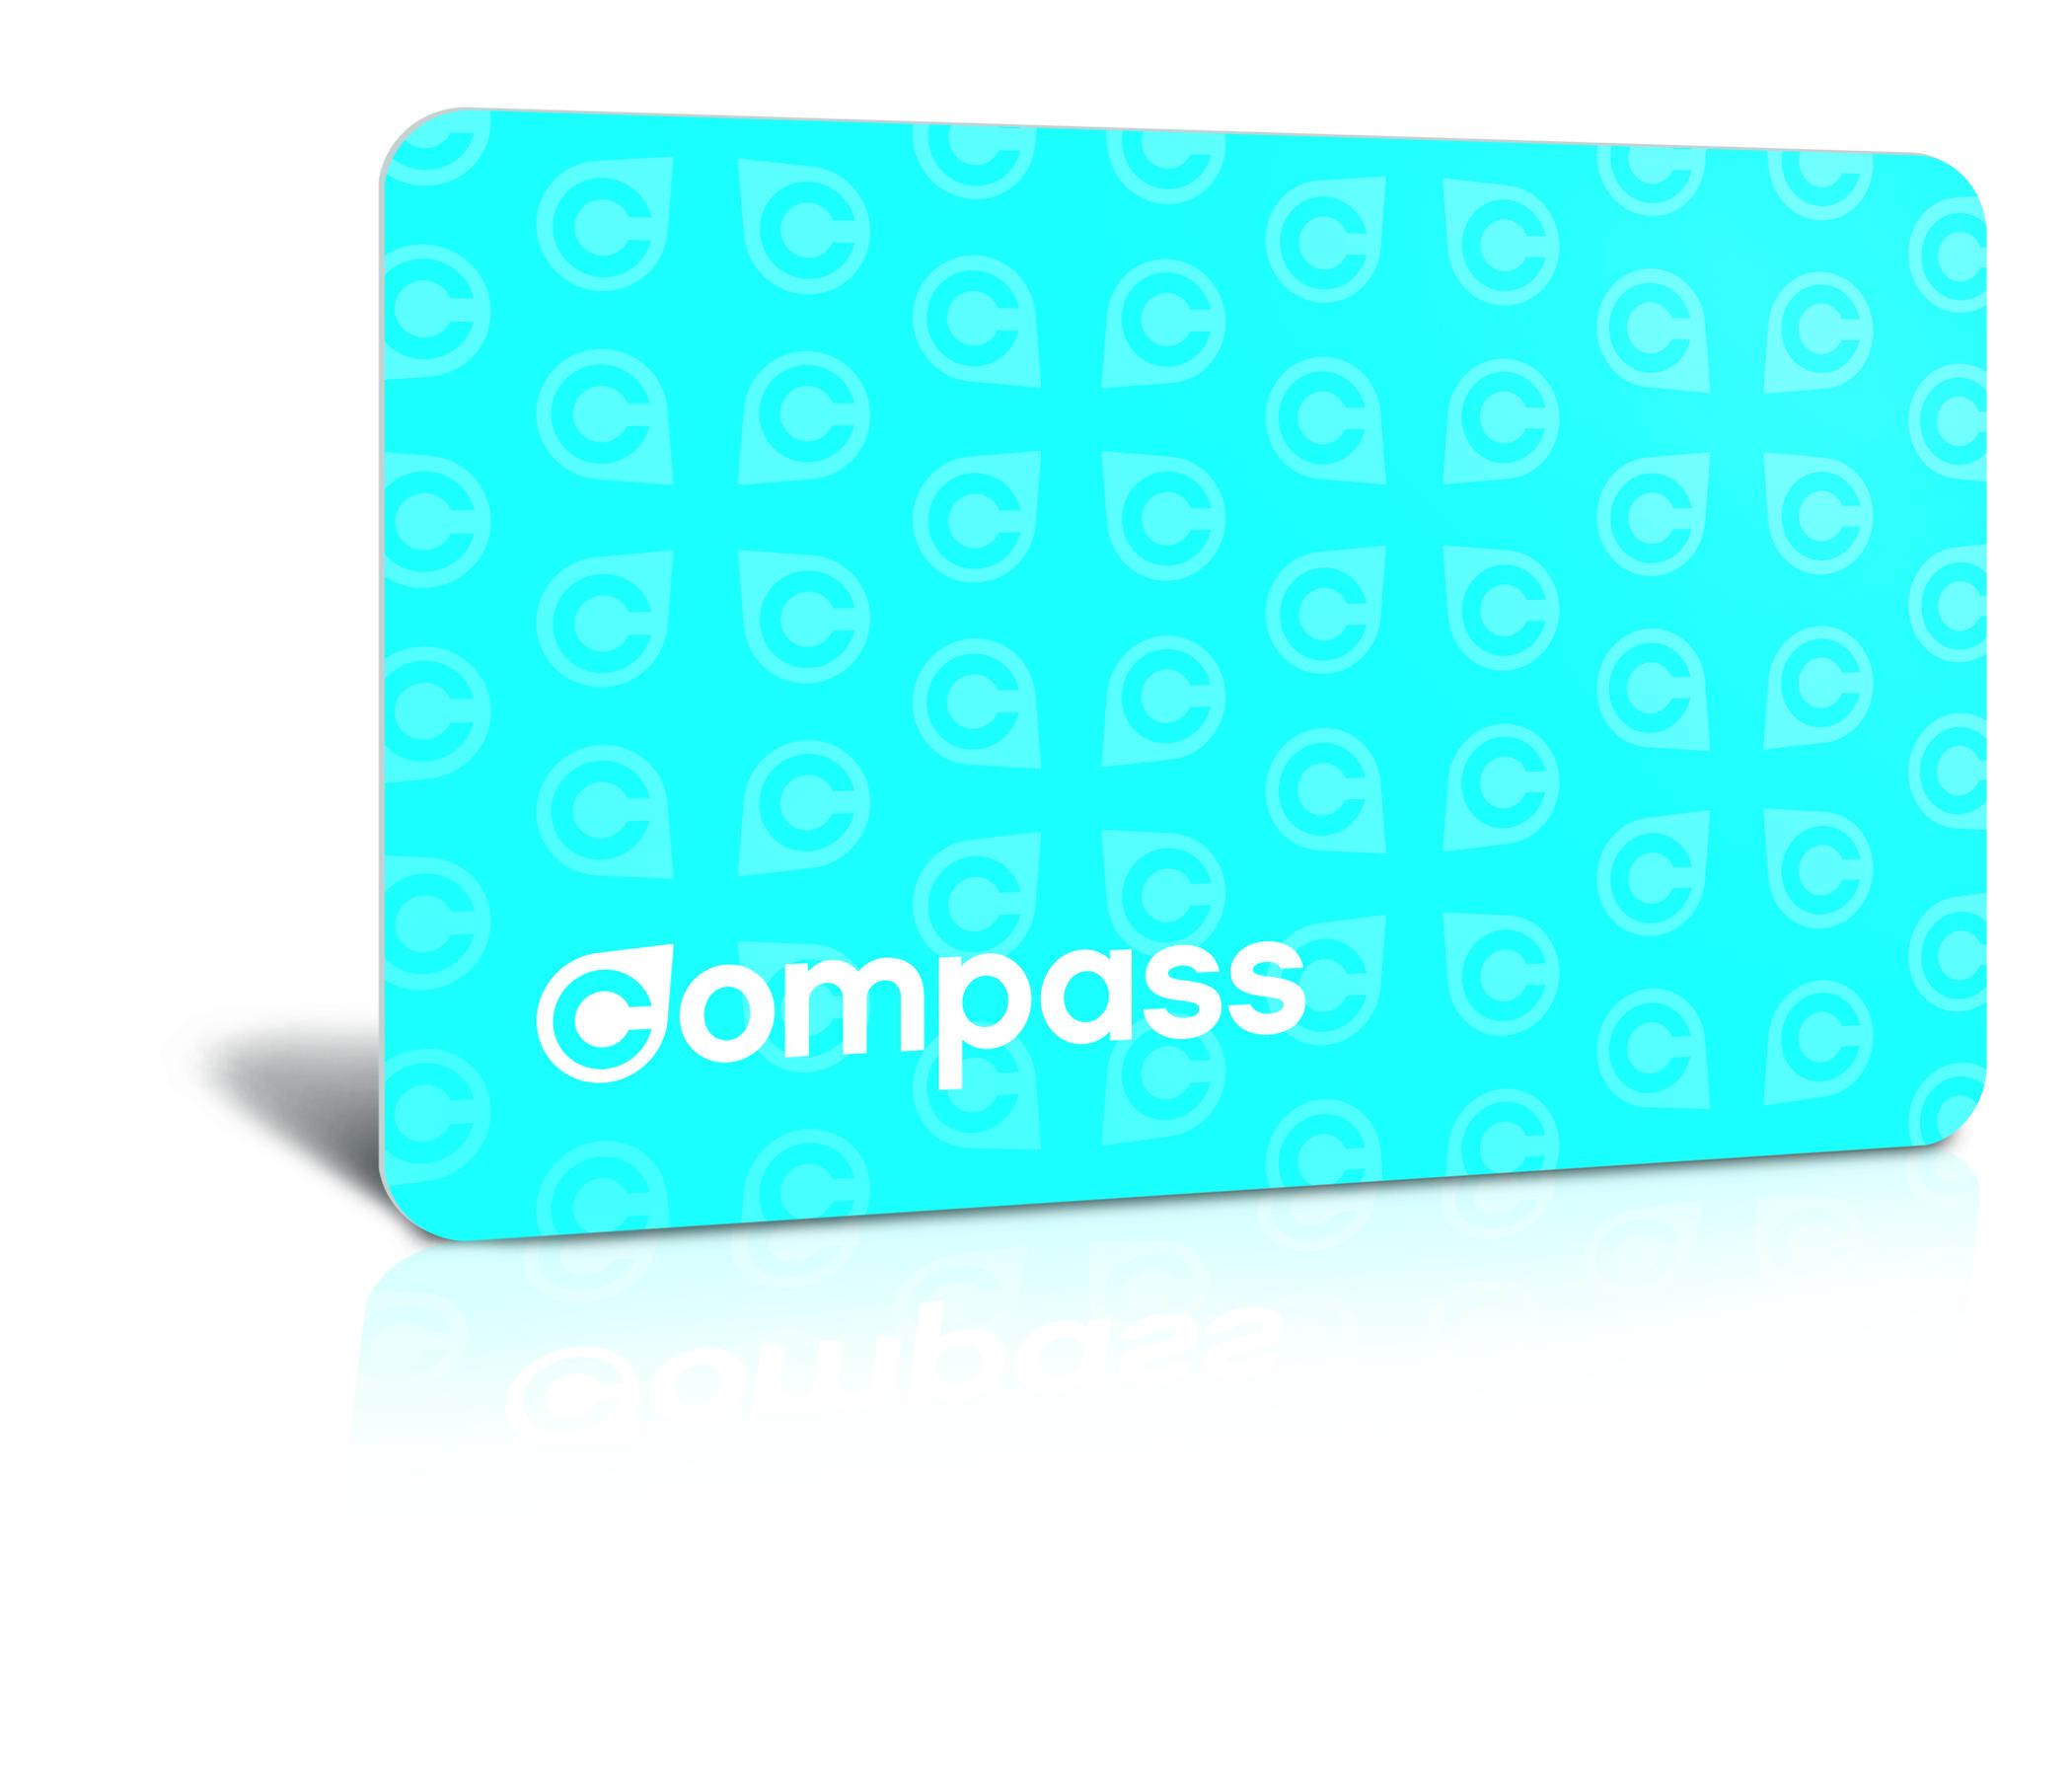 compass card image.jpg